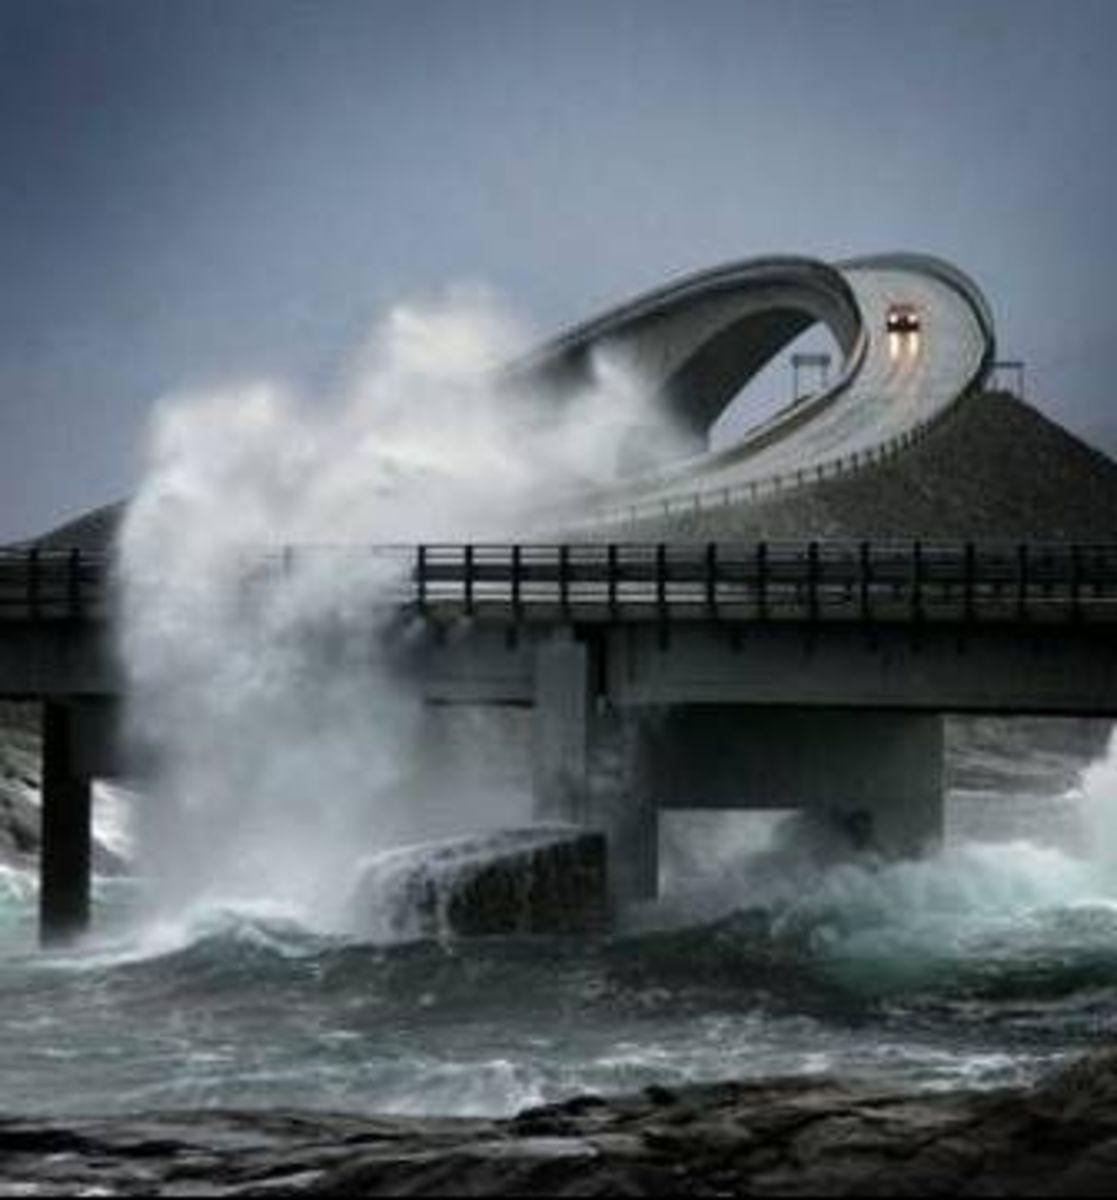 Storseisundet Bridge, Atlanterhavsveien